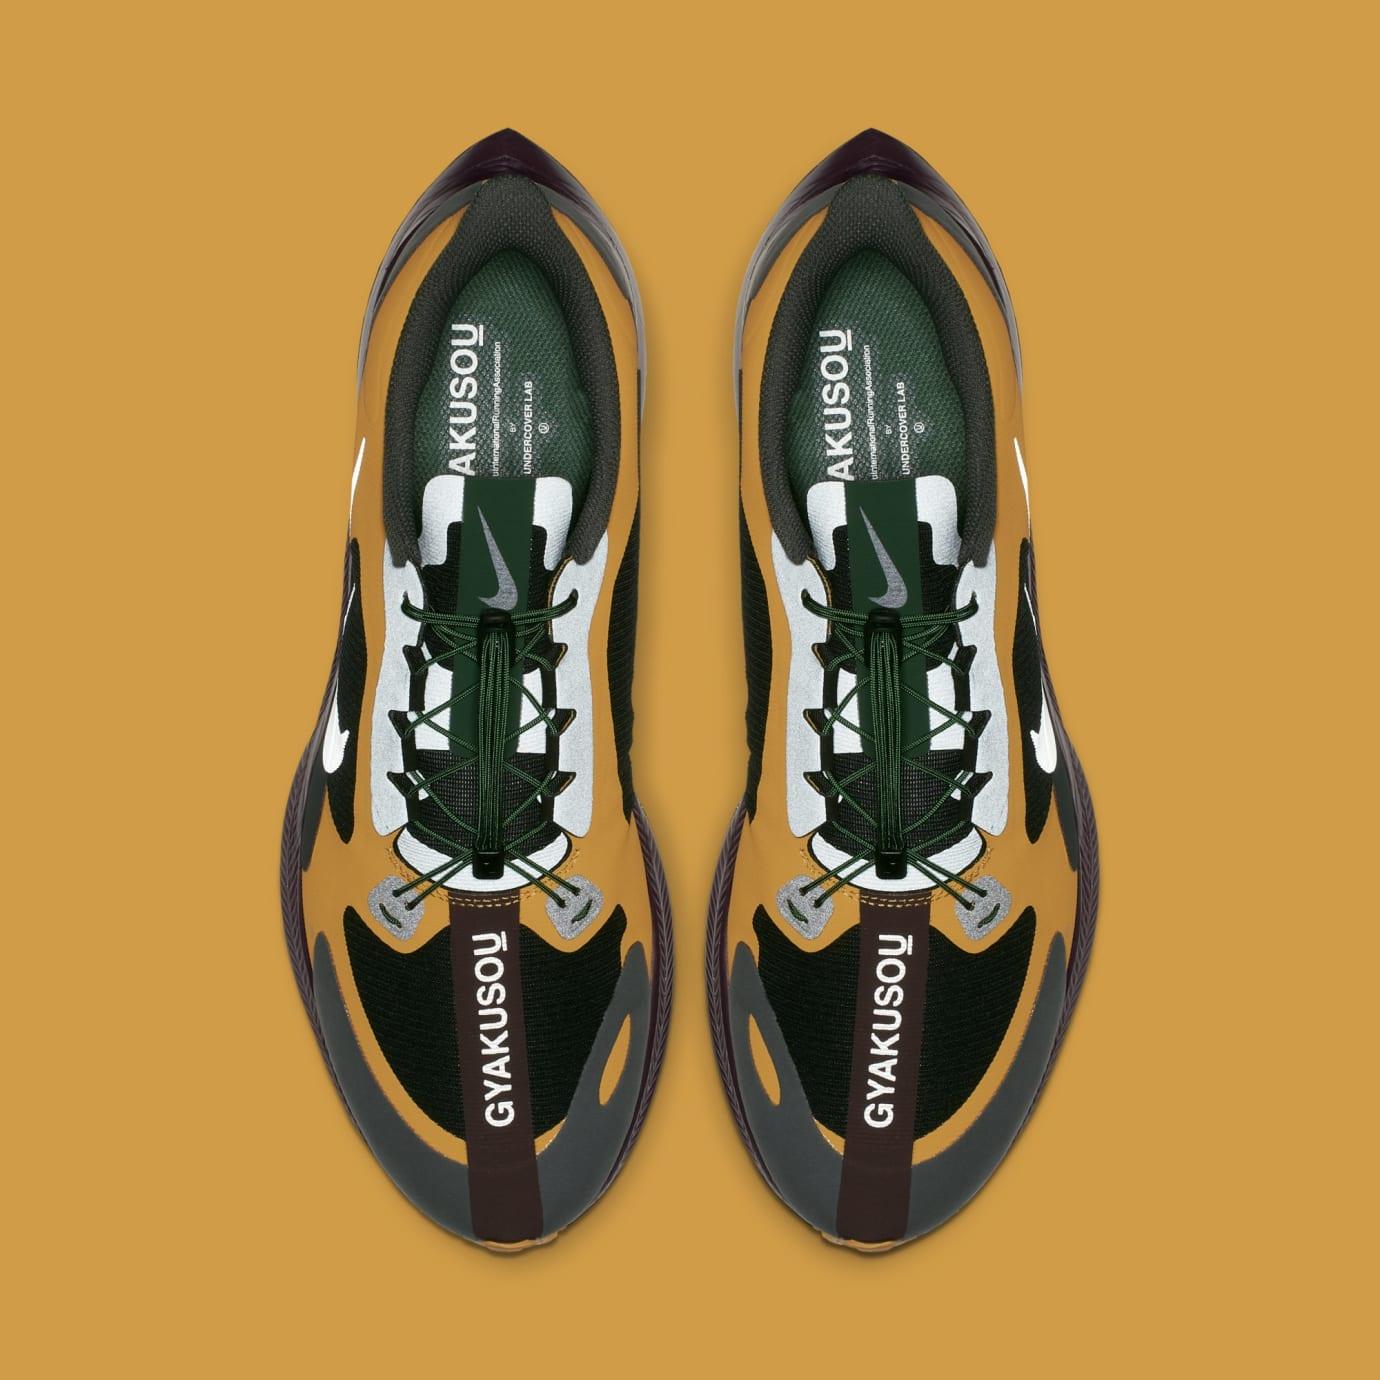 9409b723bf8d4 Image via Nike Undercover Gyakusou x Nike Zoom Pegasus Turbo BQ0579-700  (Top)